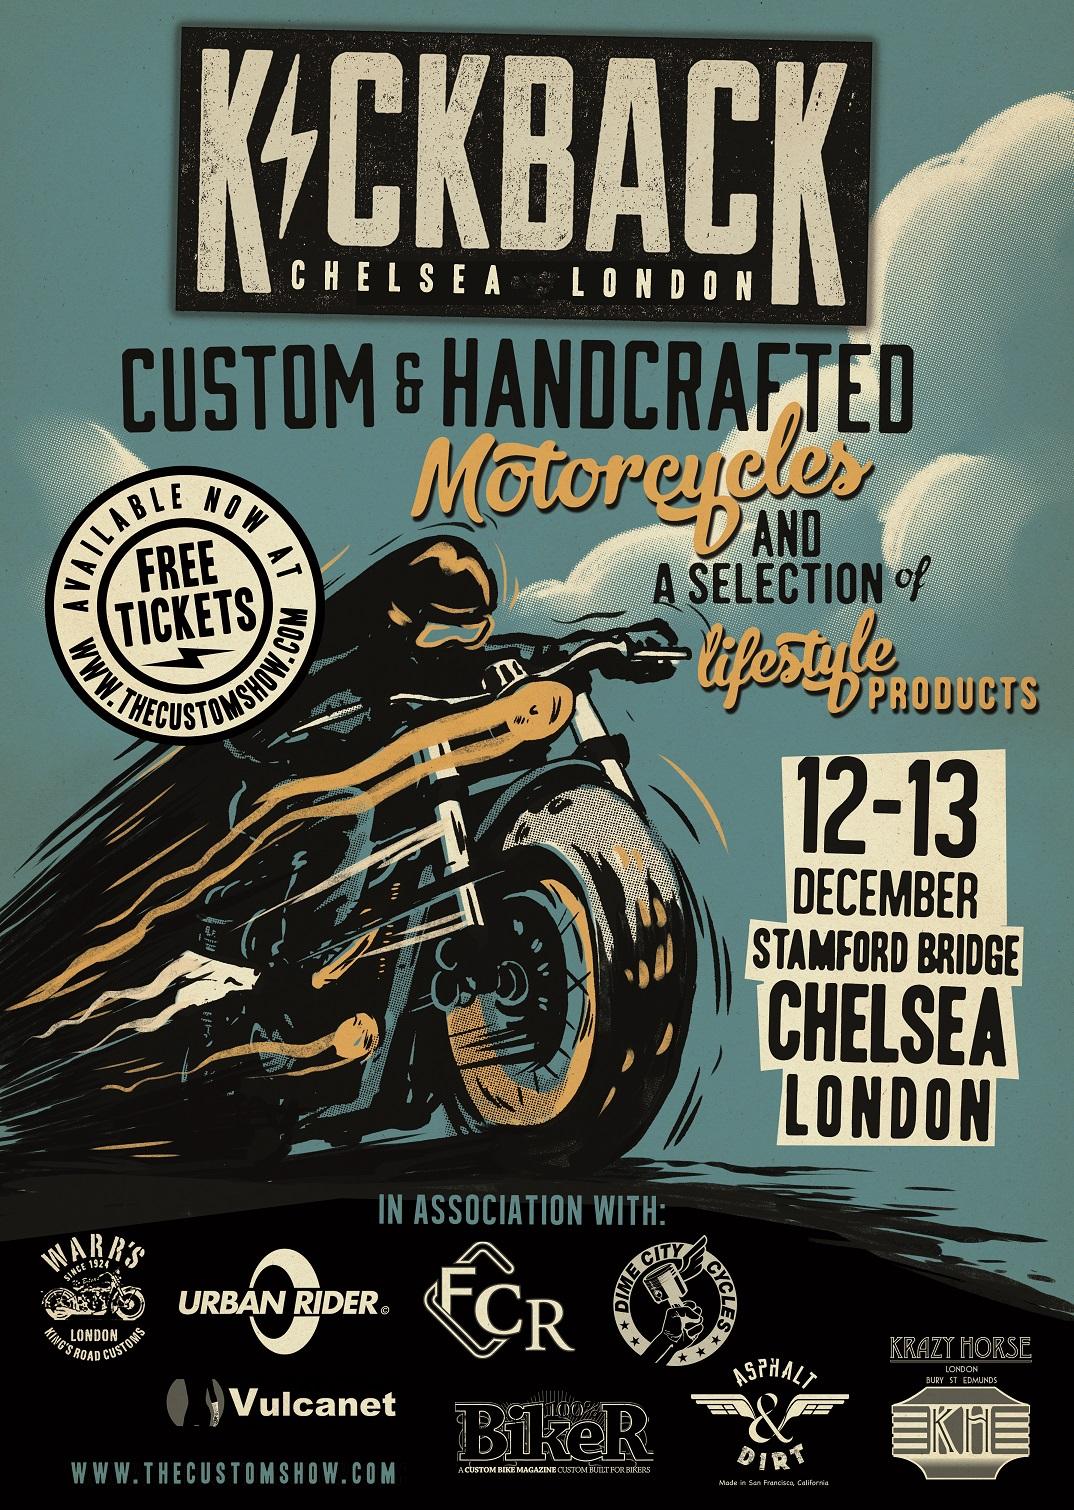 World Exclusive 007 Norton Motorbike